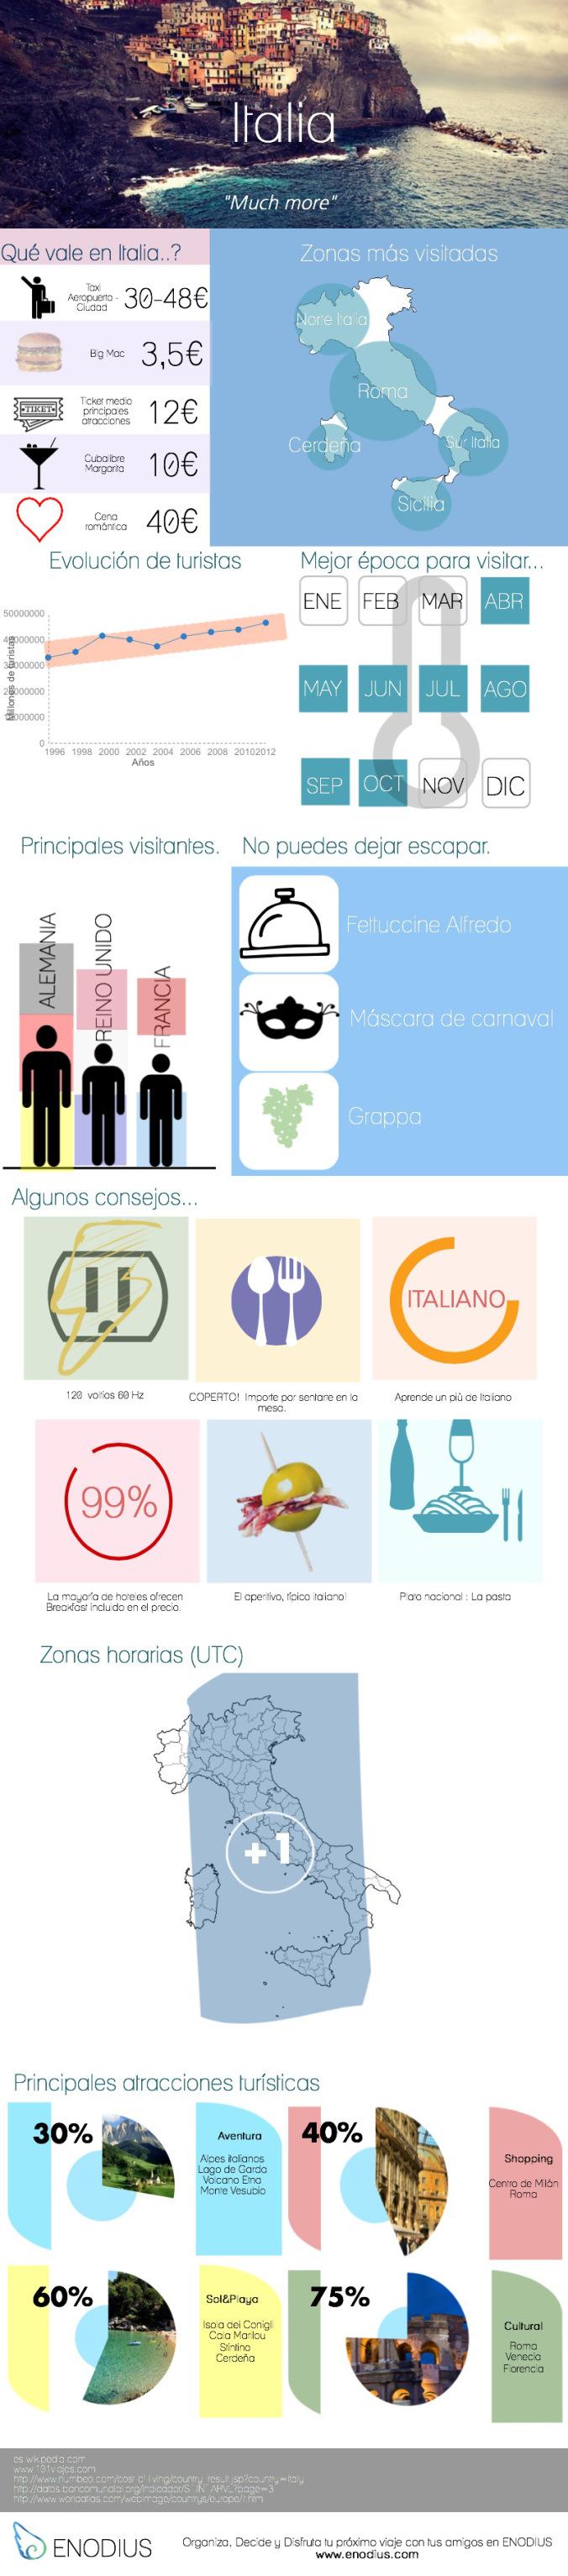 Un recorrido por Italia